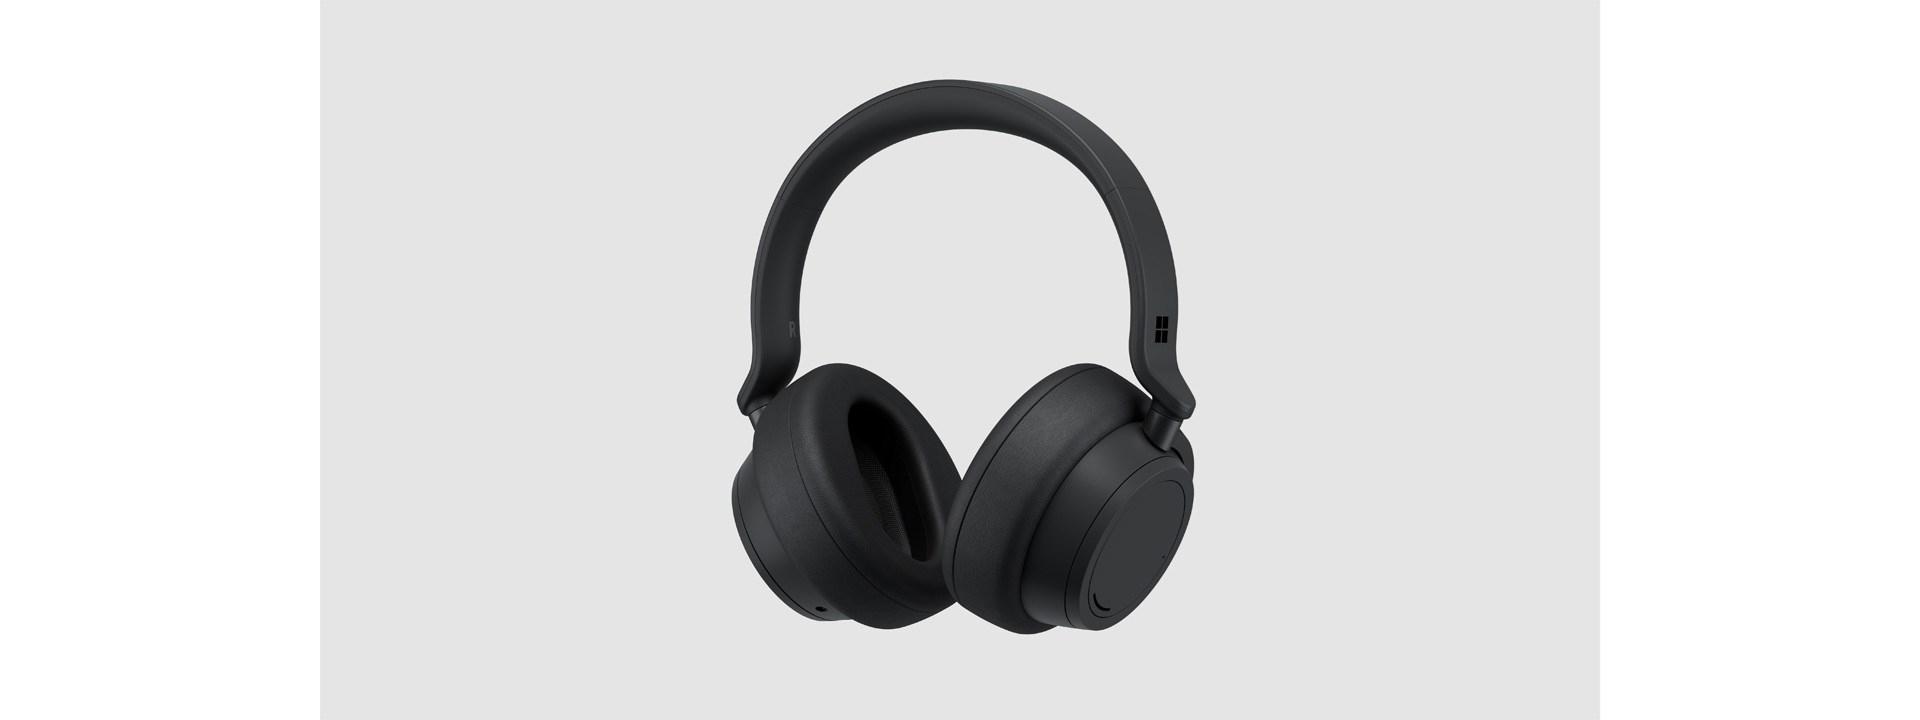 360 度展示 Surface Headphone 2